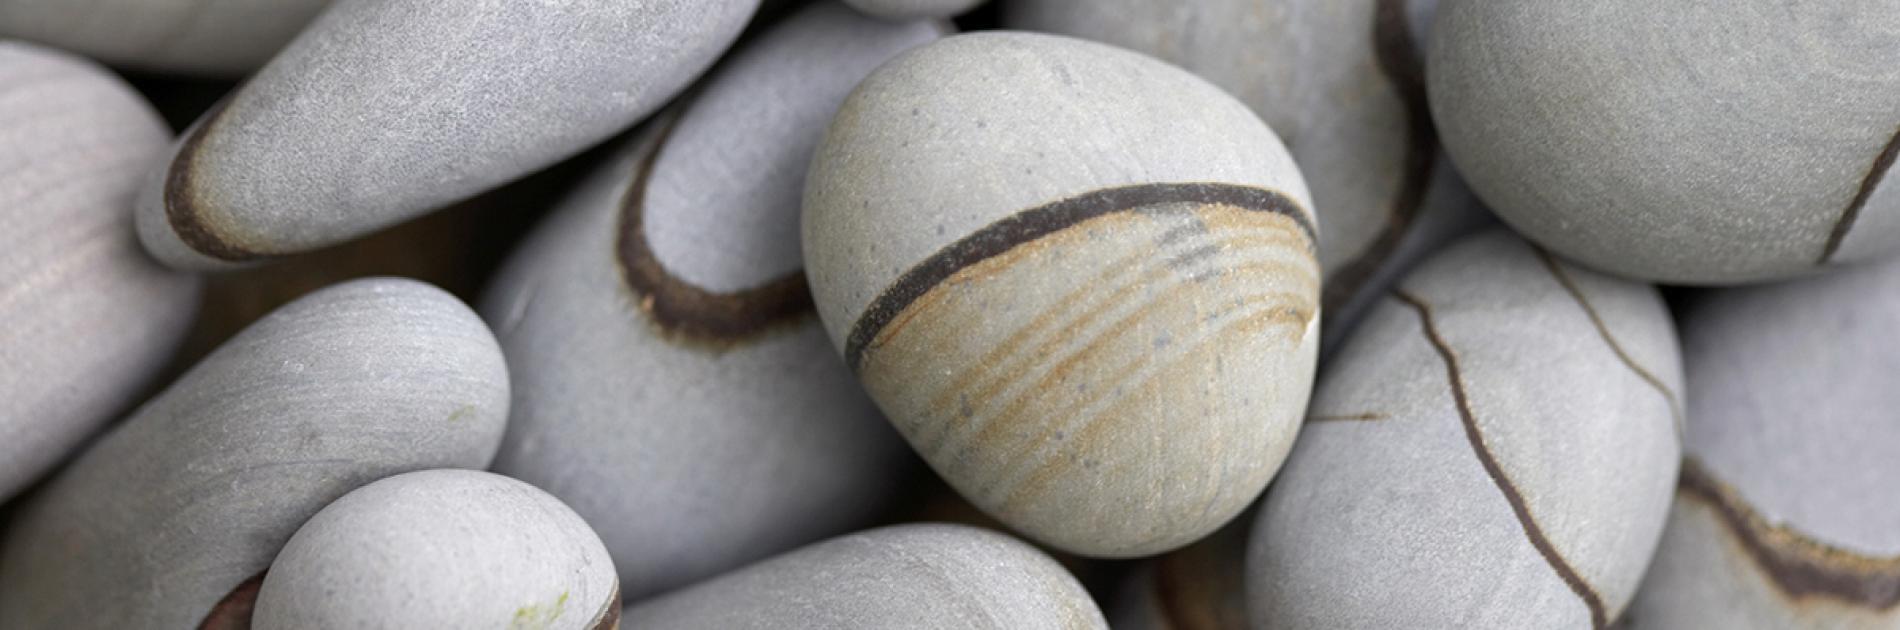 stenenPebbles